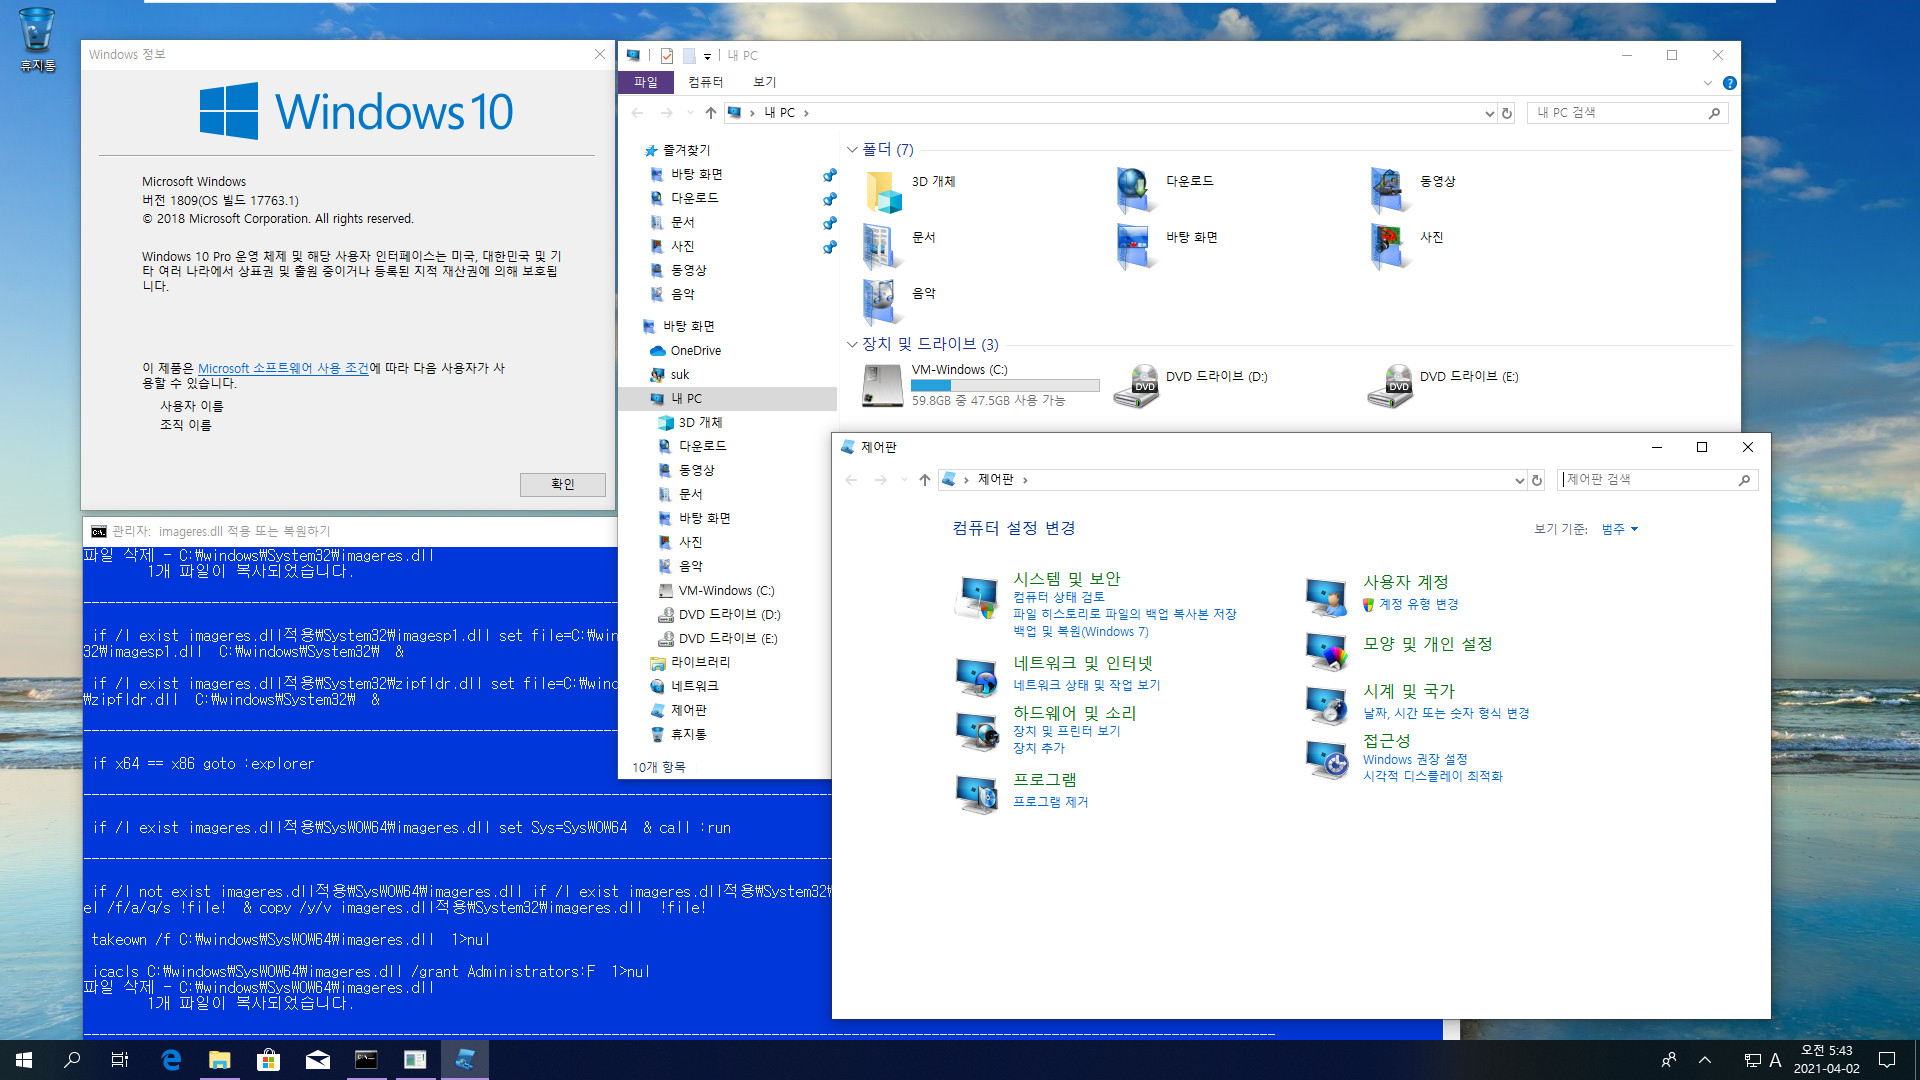 imageres.dll 적용하면 부팅이 안 되는 윈도우는 imageres.dll 2개를 합치면 부팅 됩니다 2021-04-02_054354.jpg